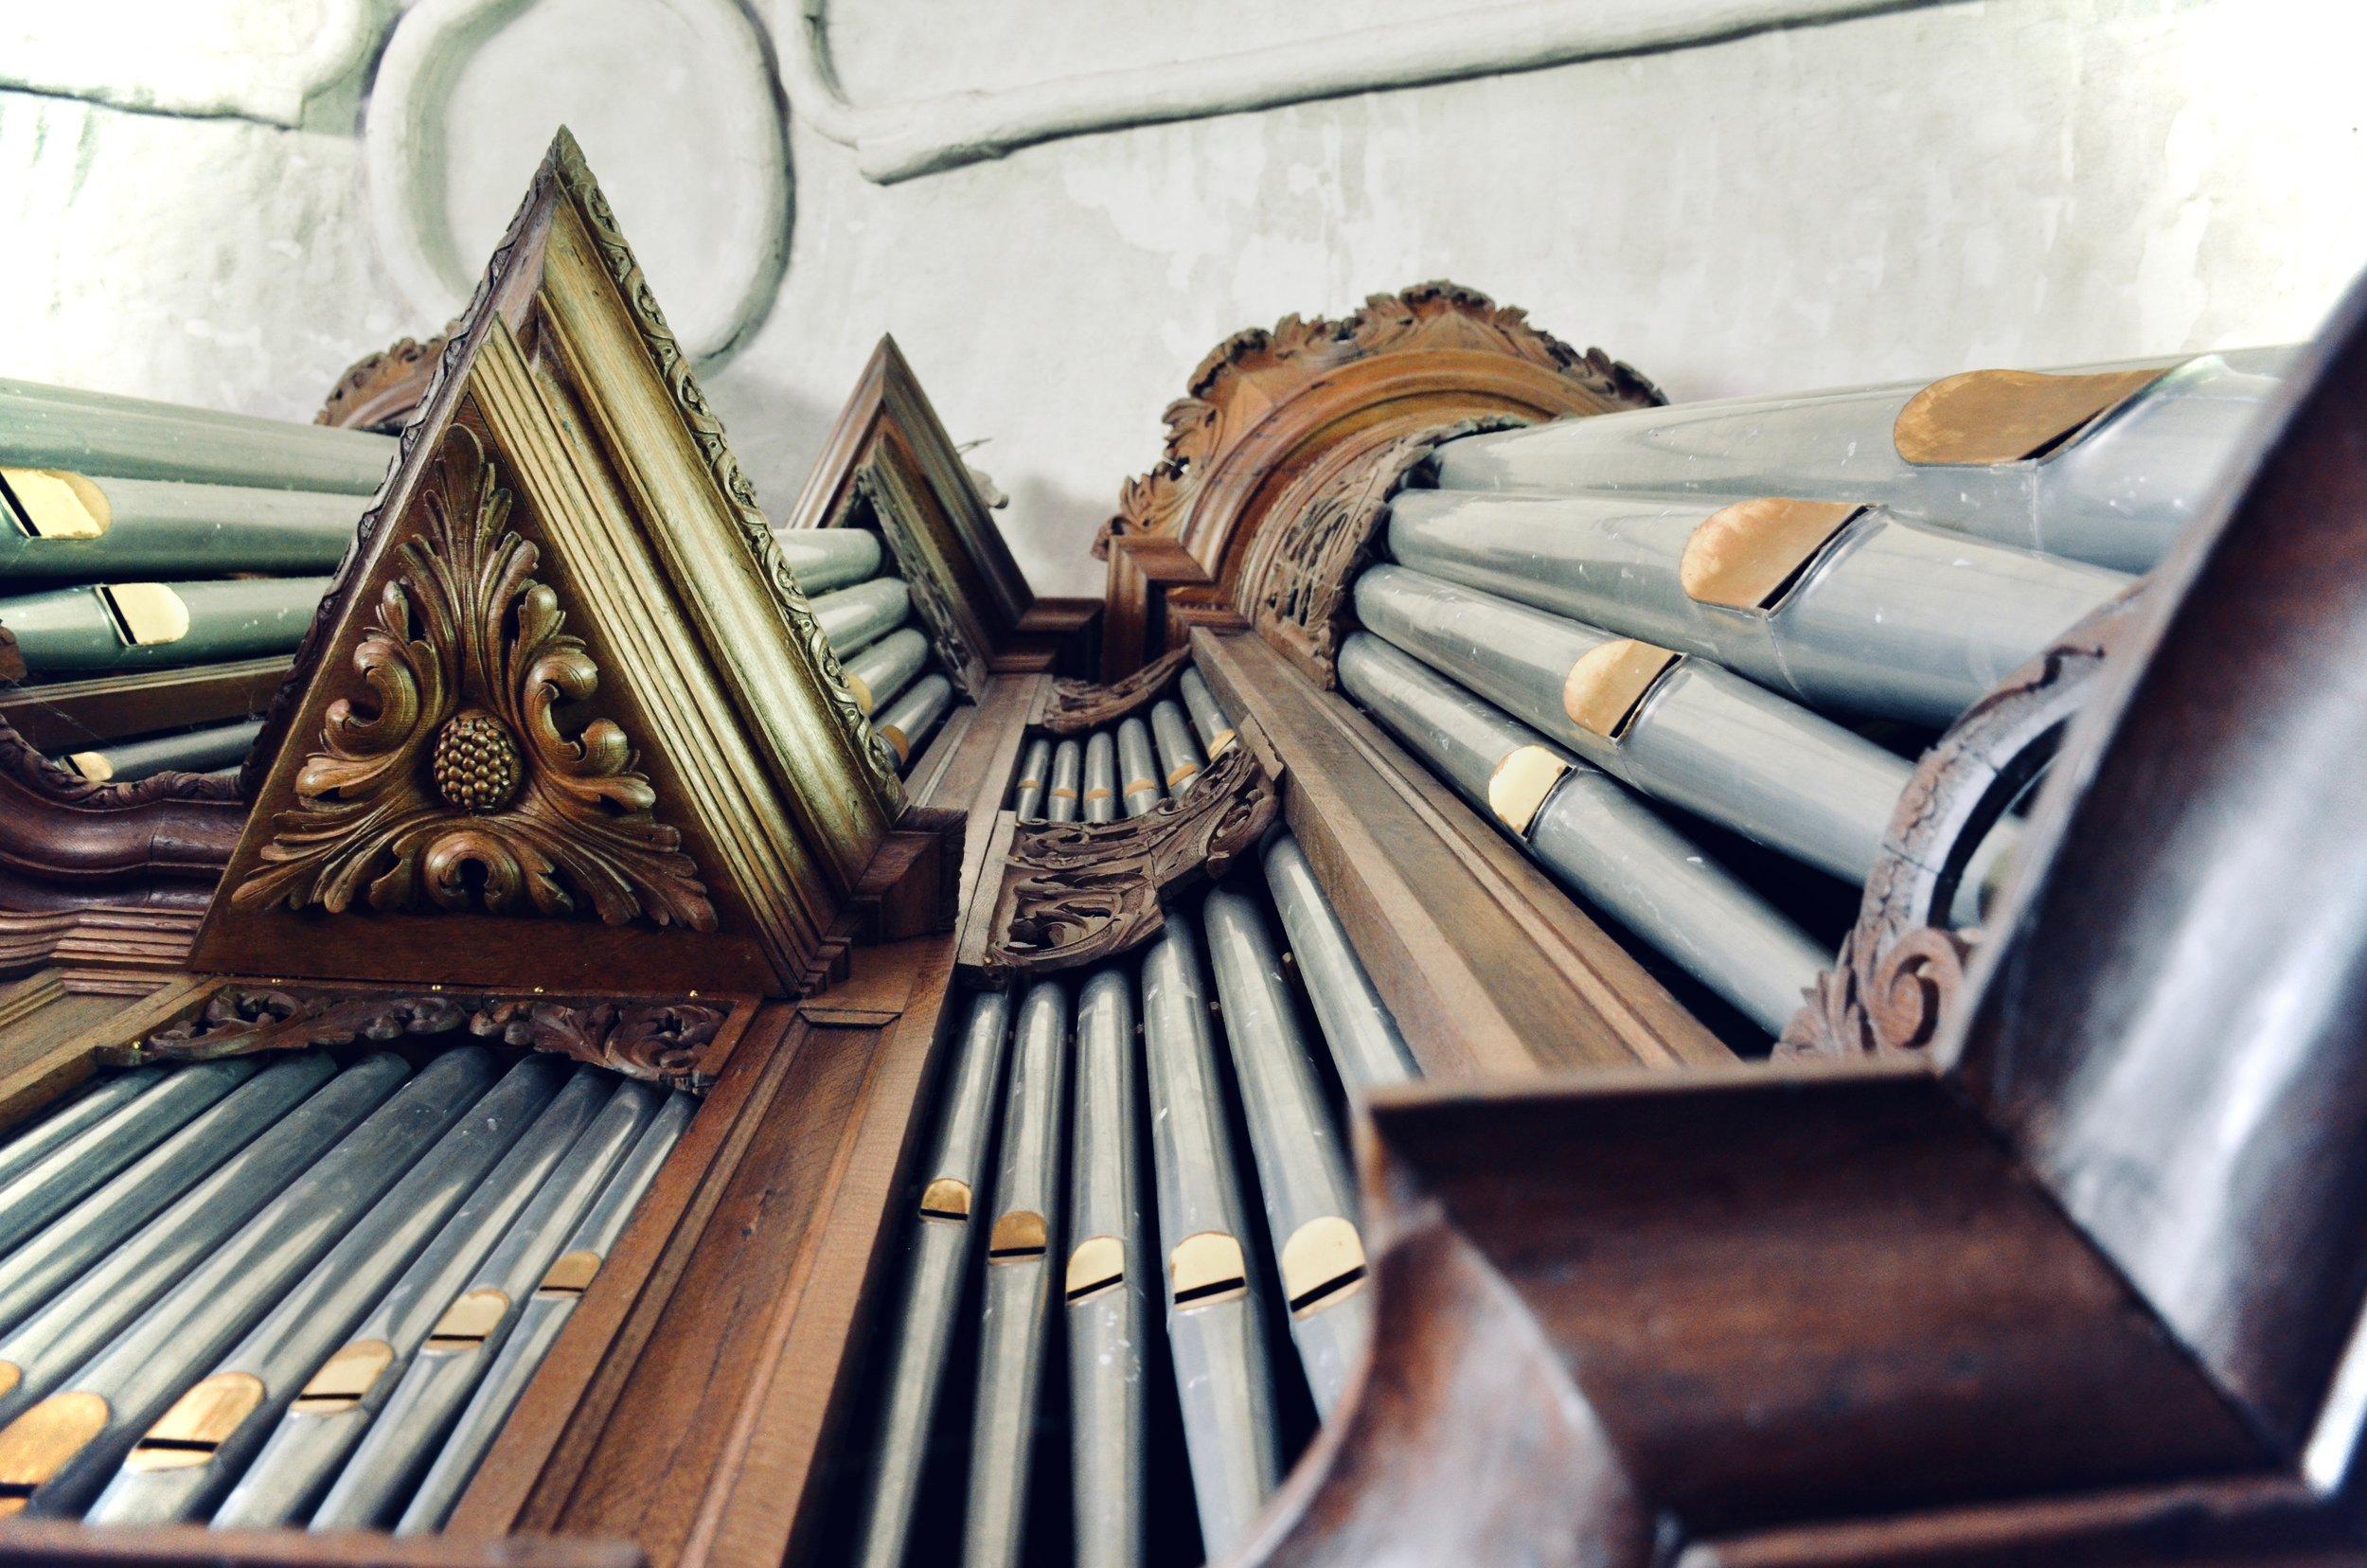 Façade detail, Hinsz organ, Leens, Holland.